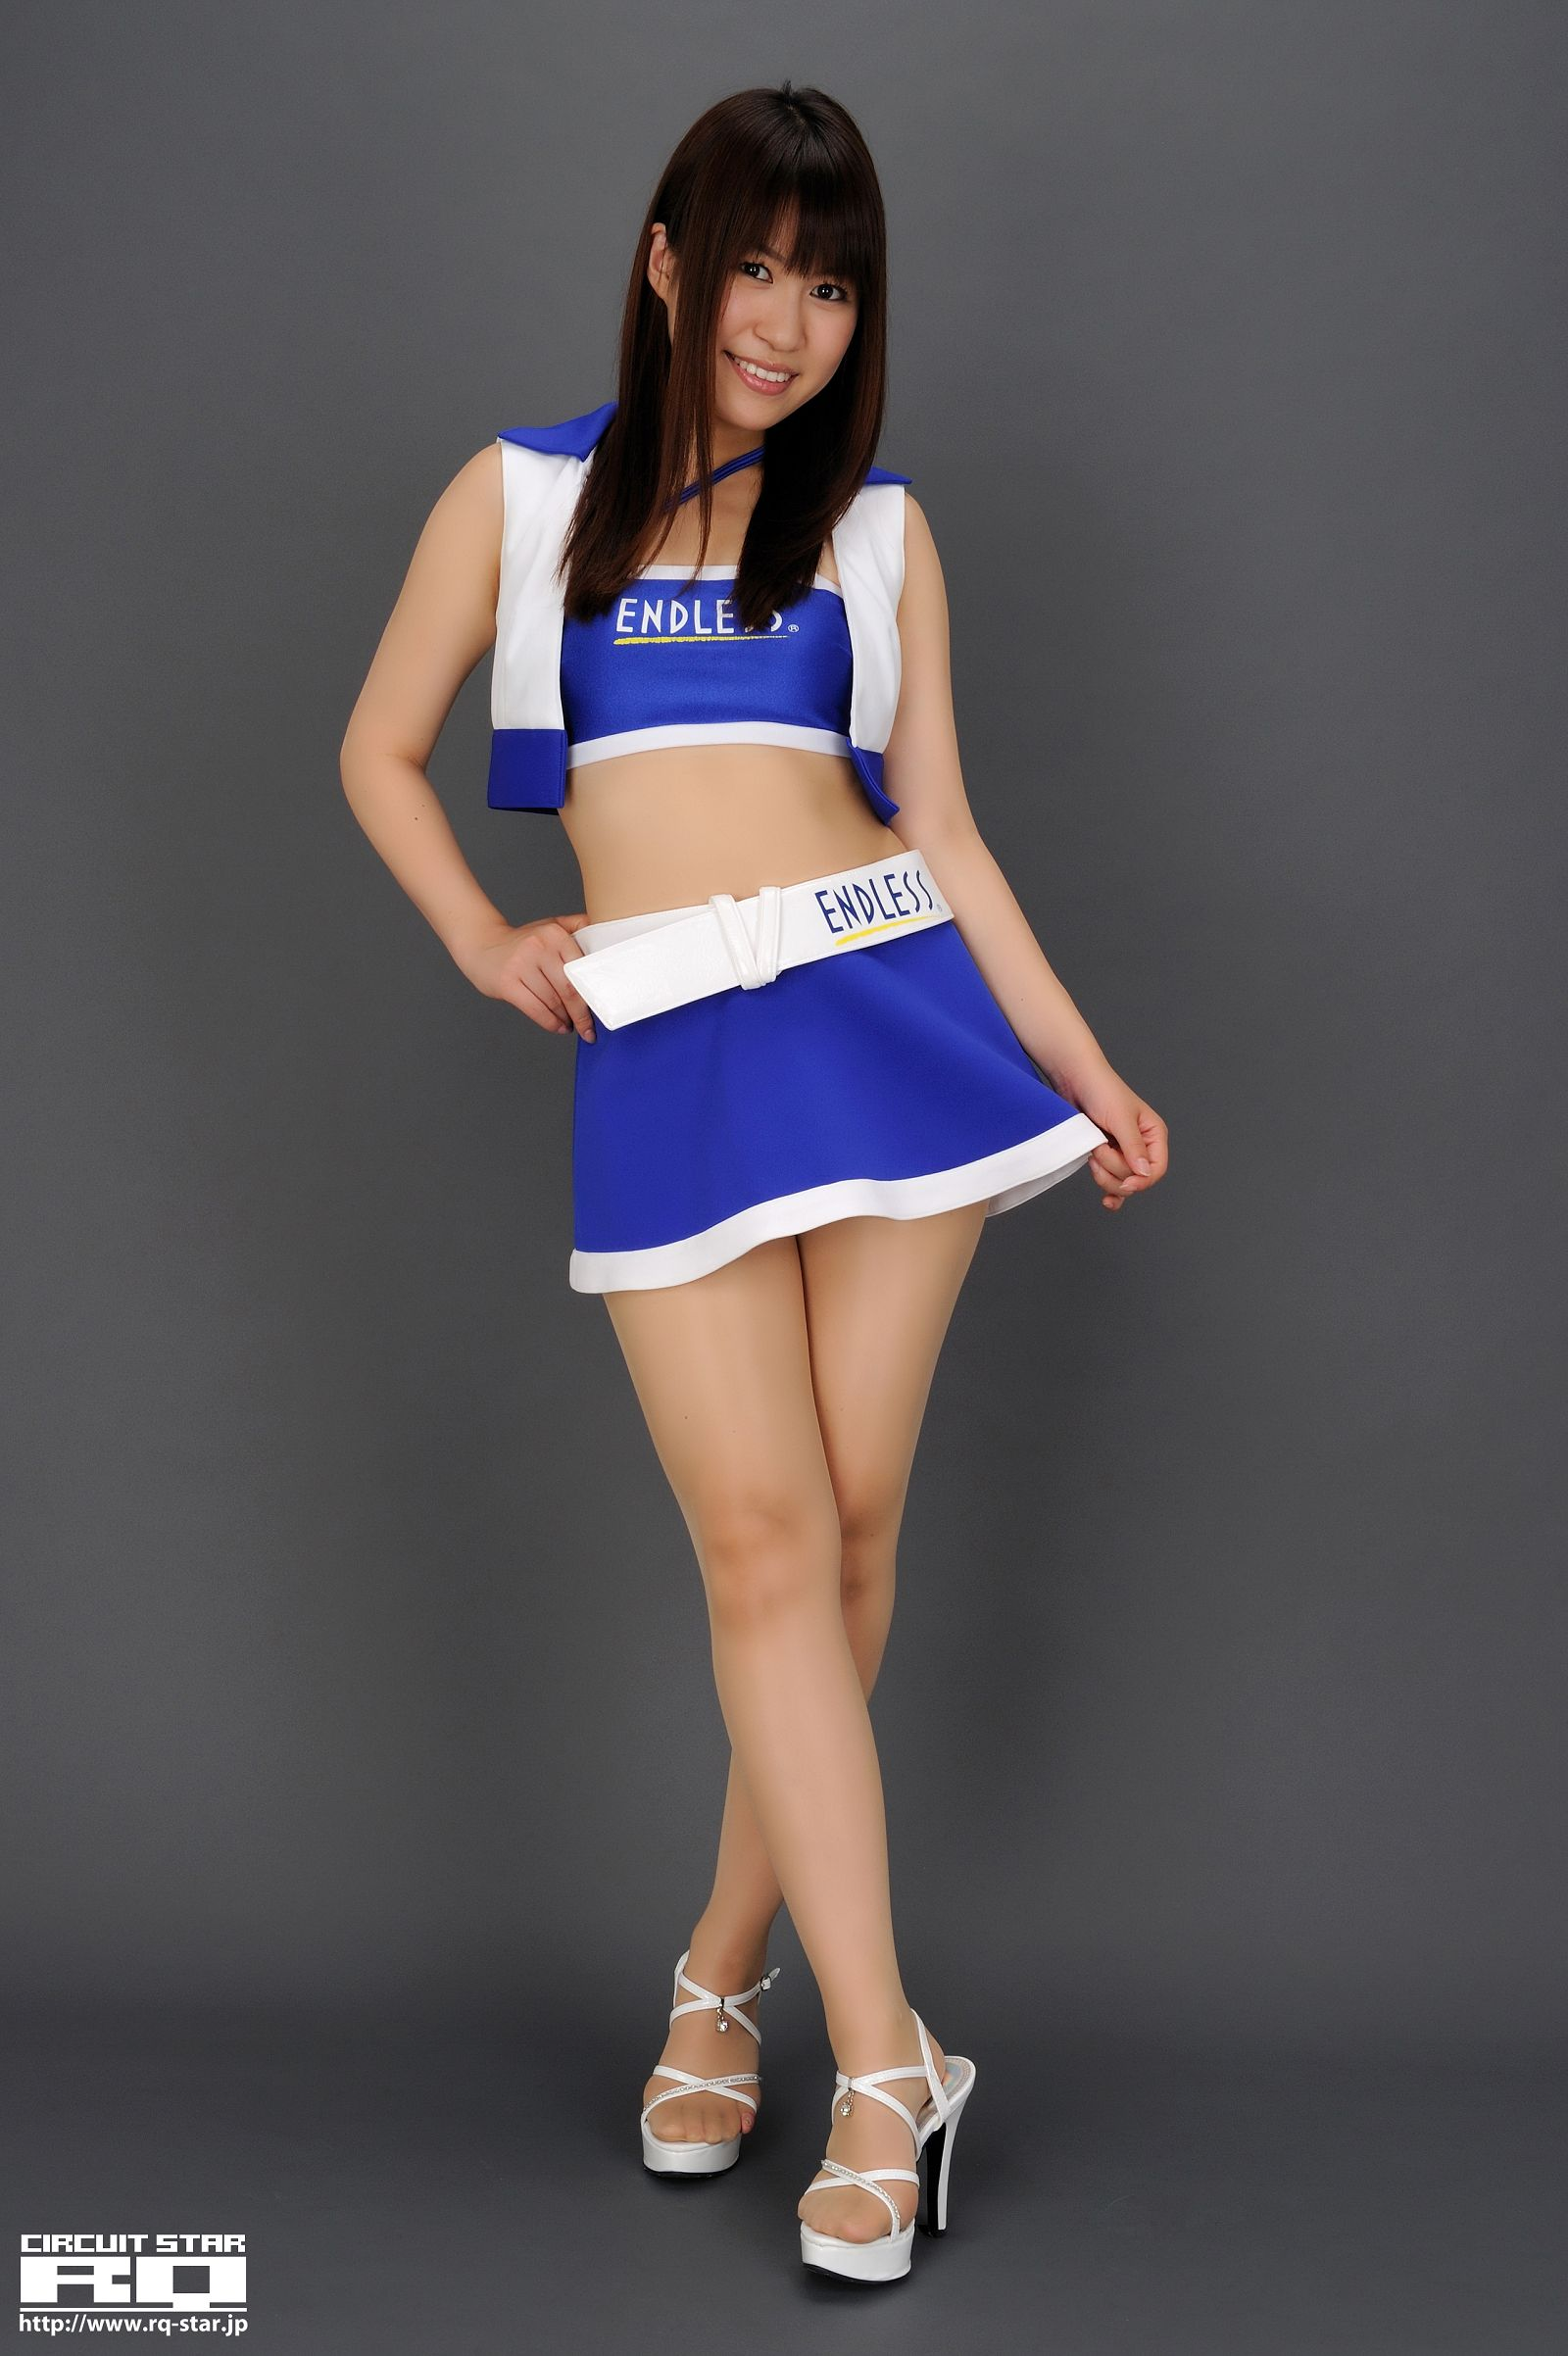 [RQ STAR美女] NO.0306 Emi Sakura 佐倉恵美 Race Queen[118P] RQ STAR 第1张